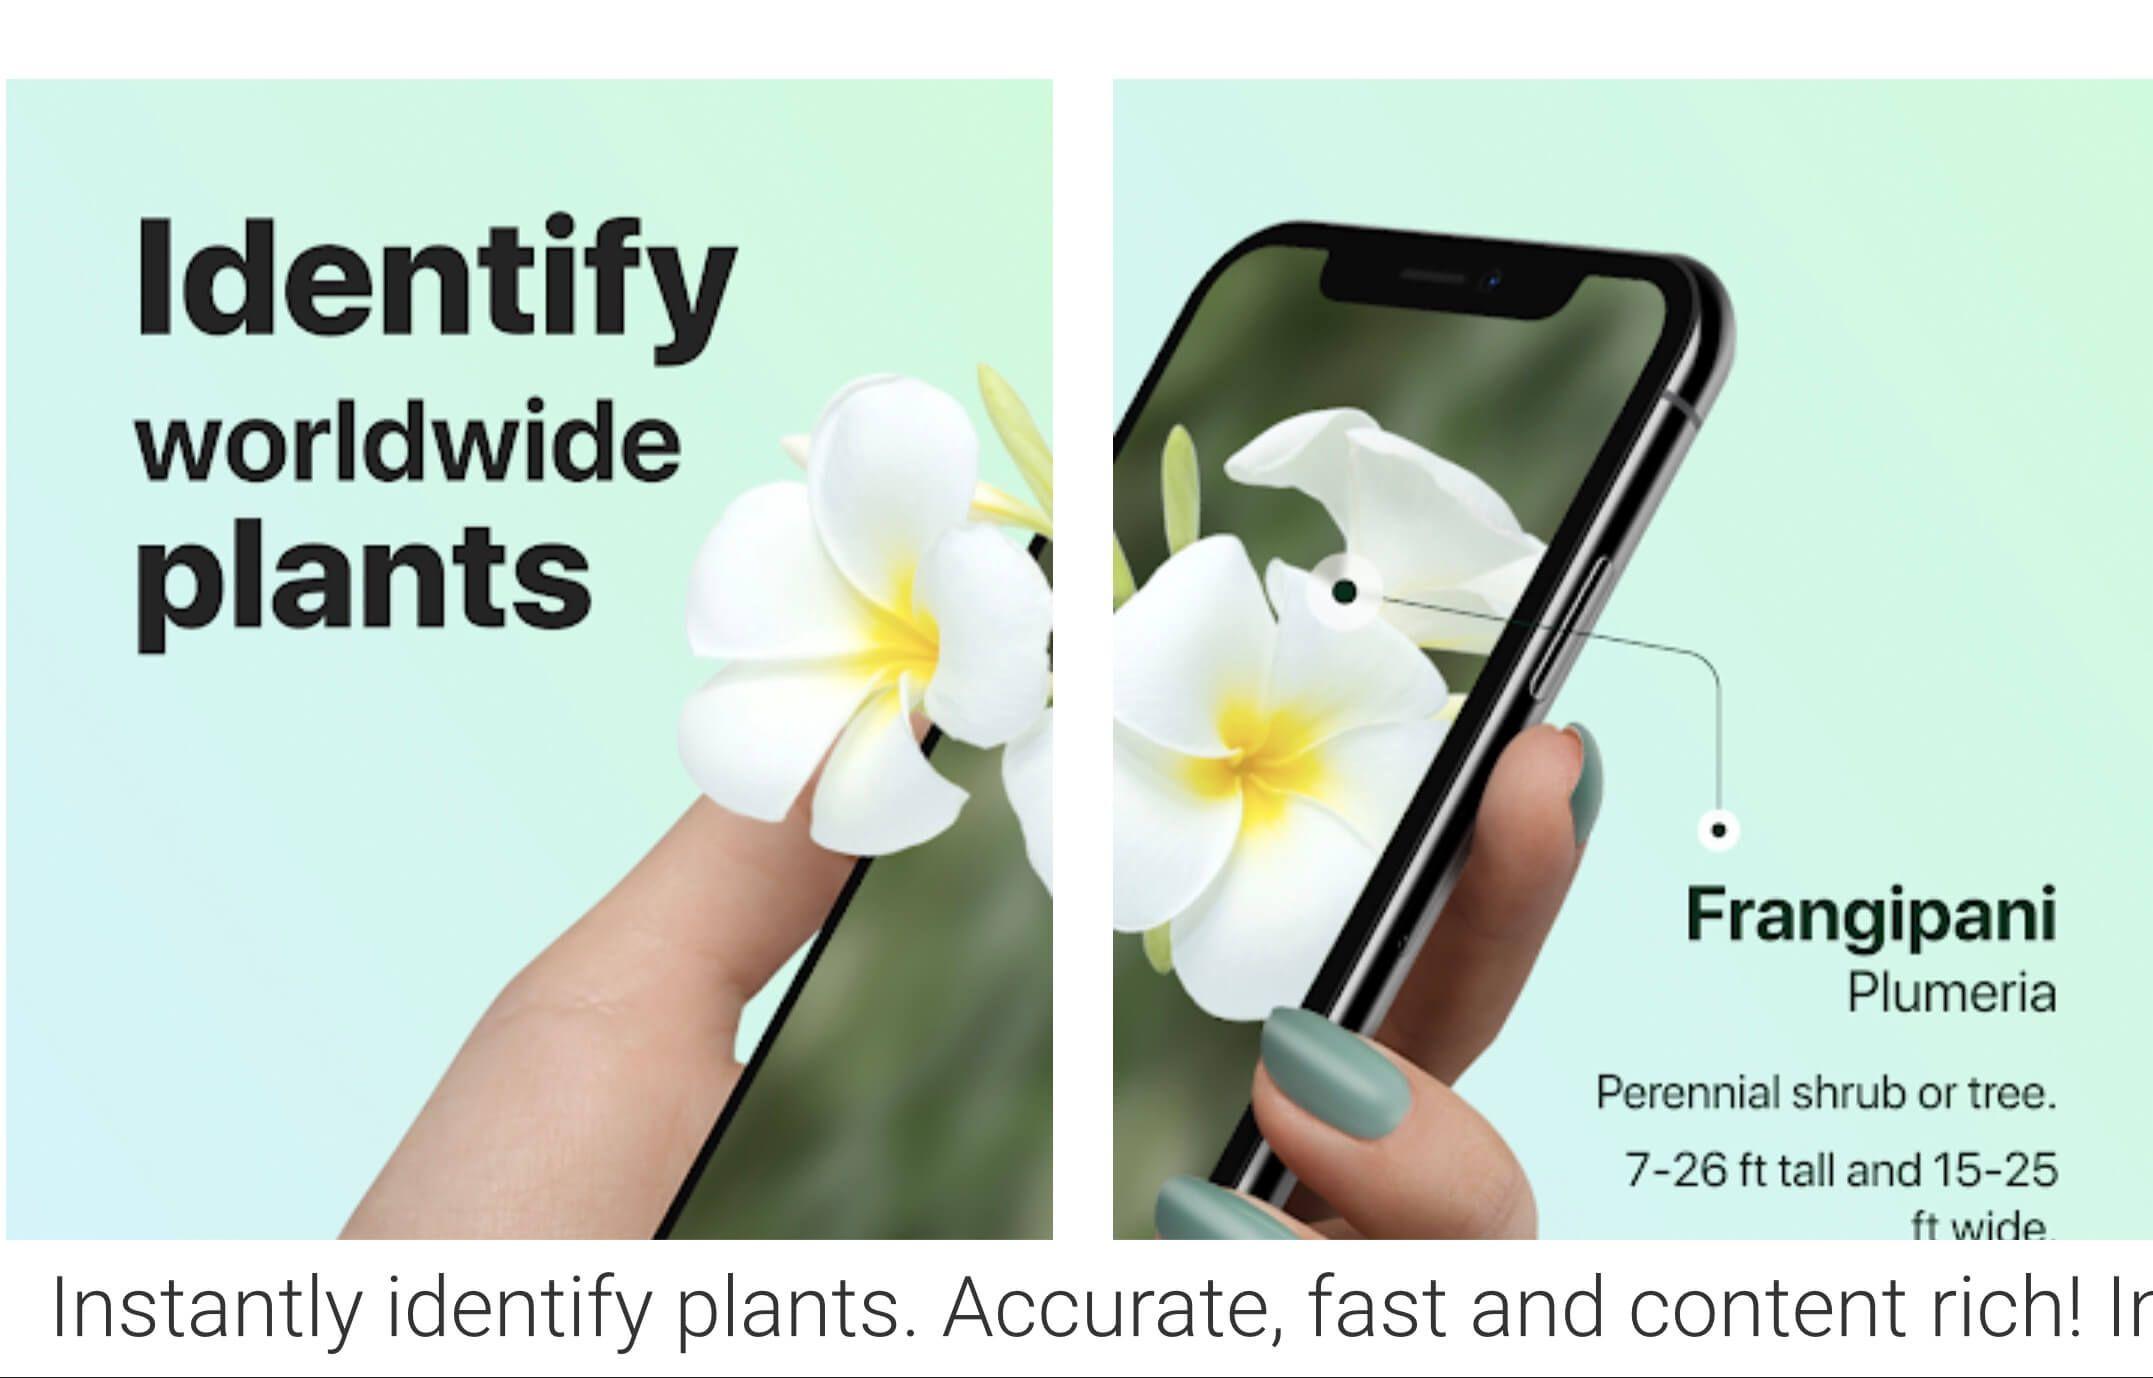 98f081fd663157d79428c914e3e3b38e - Best Free Gardening Apps For Android